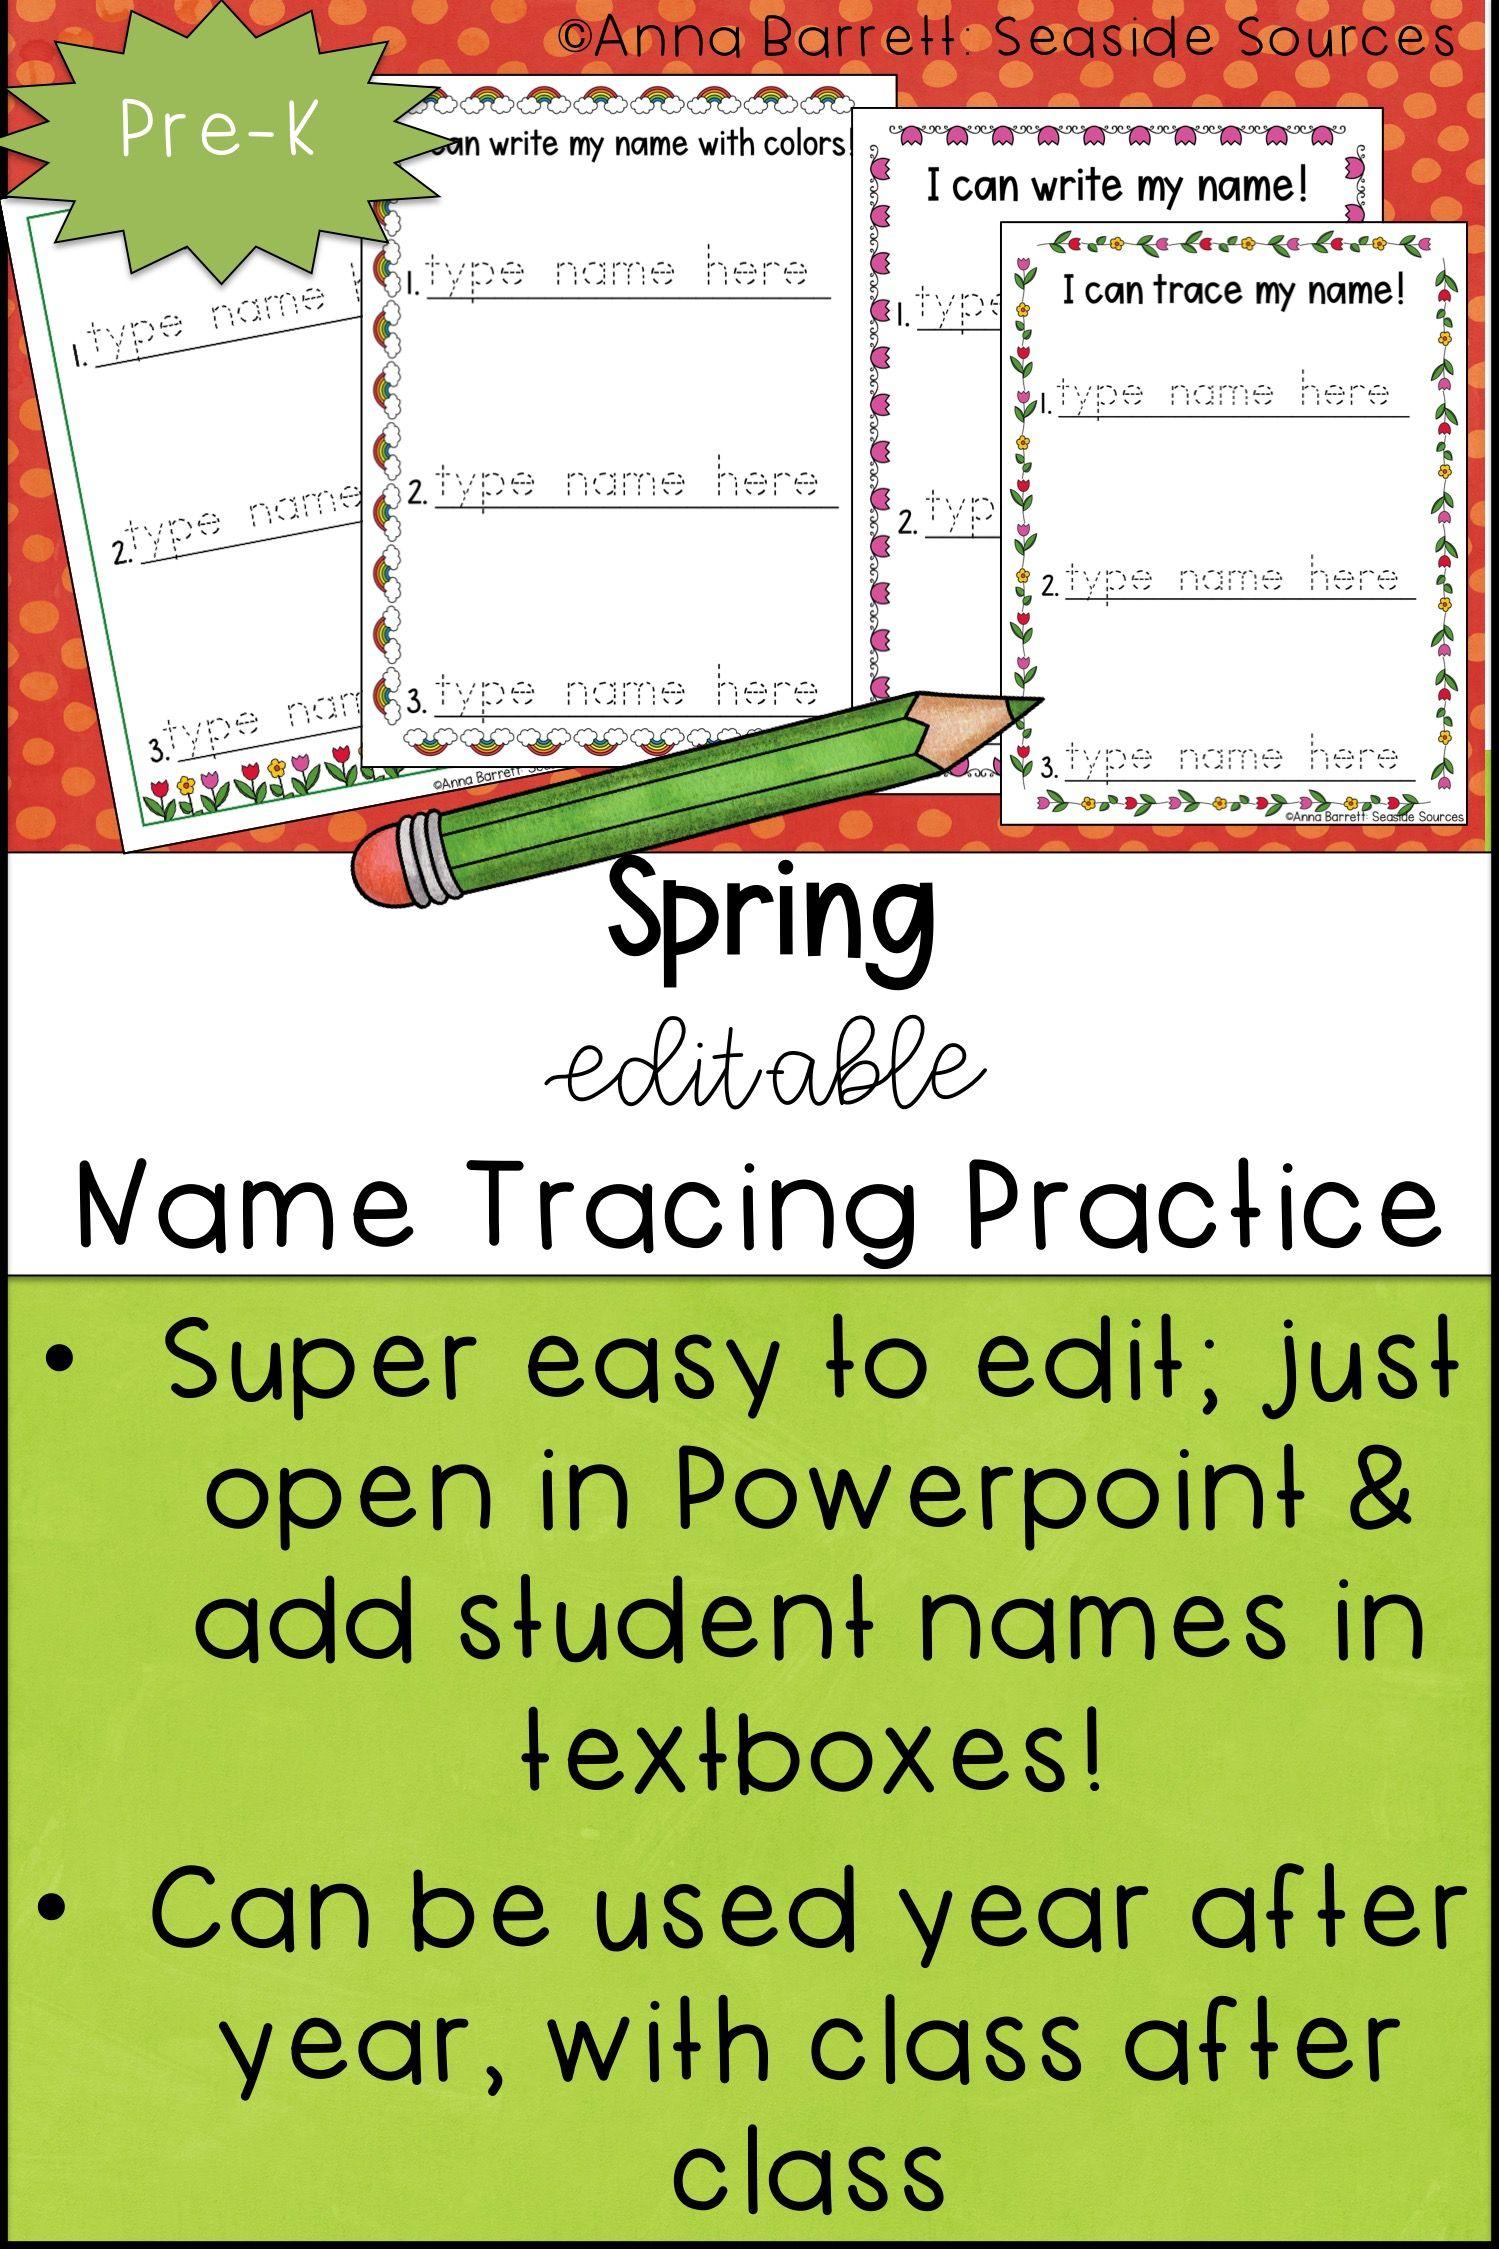 Spring Editable Name Tracing Practice   Name Tracing, Name